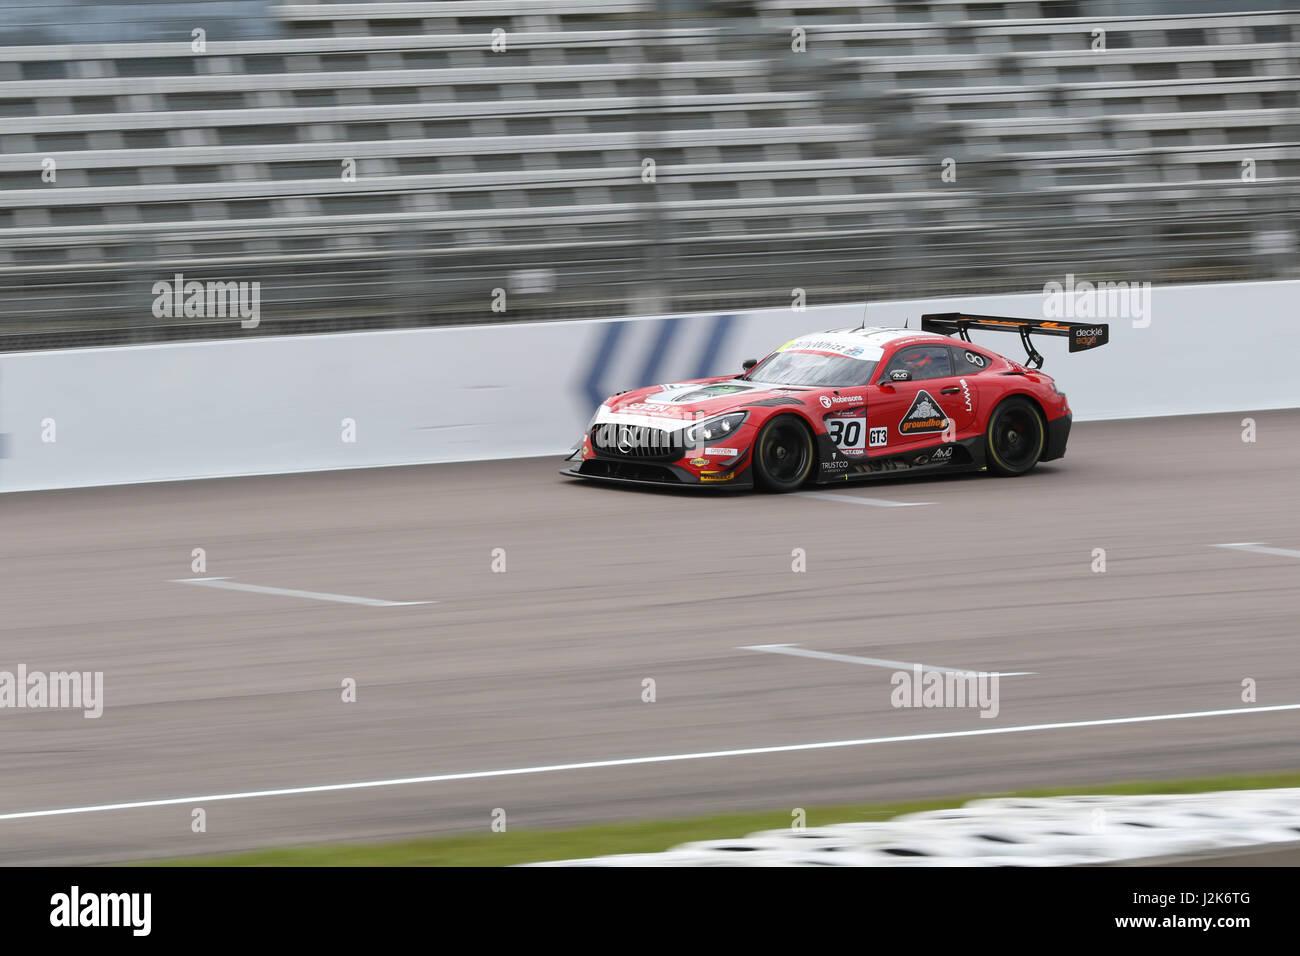 Rockingham, United Kingdom. 29th Apr, 2017. AMD Tuning during qualifying for the British GT at Rockingham Motor Speedway Credit: Paren Raval/Alamy Live News